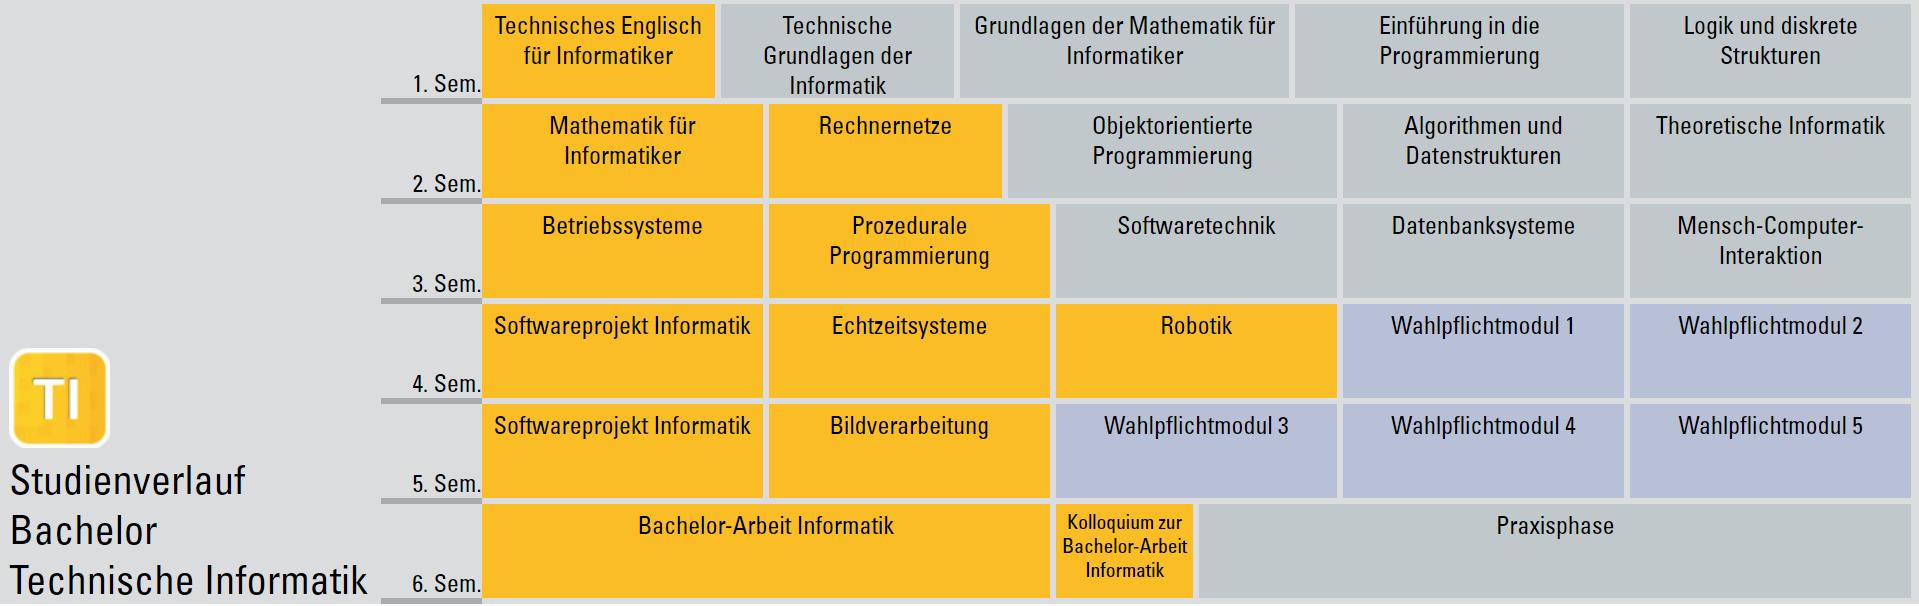 Studienverlaufsplan Bachelor Informatik (Studienrichtung Technische Informatik)